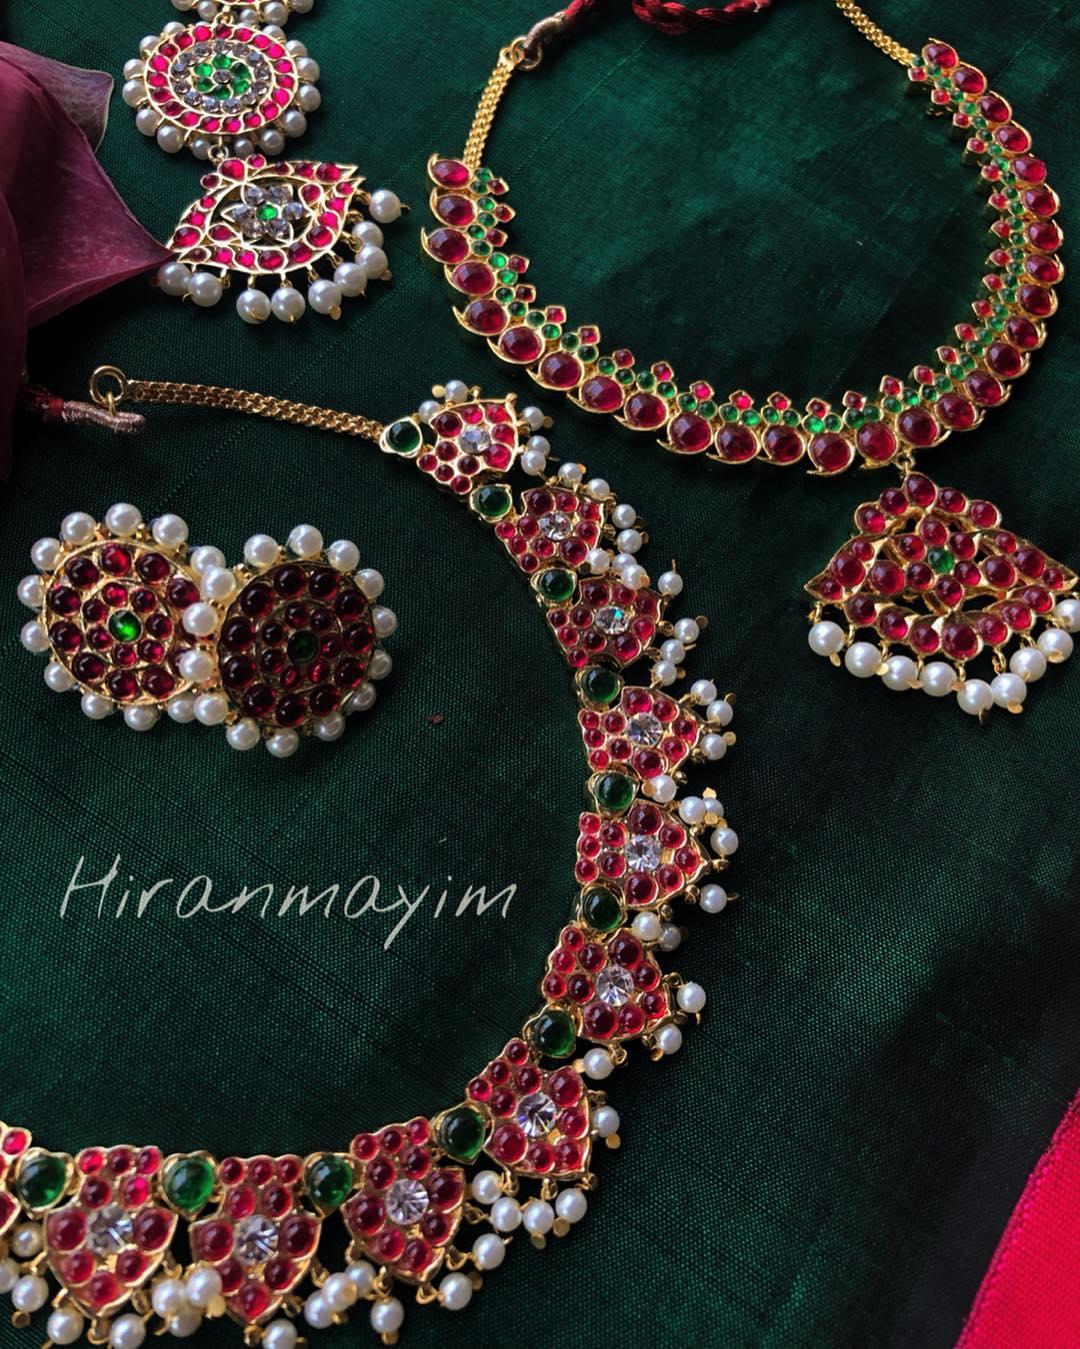 kemp-jewellery-designs-shop-online (6)